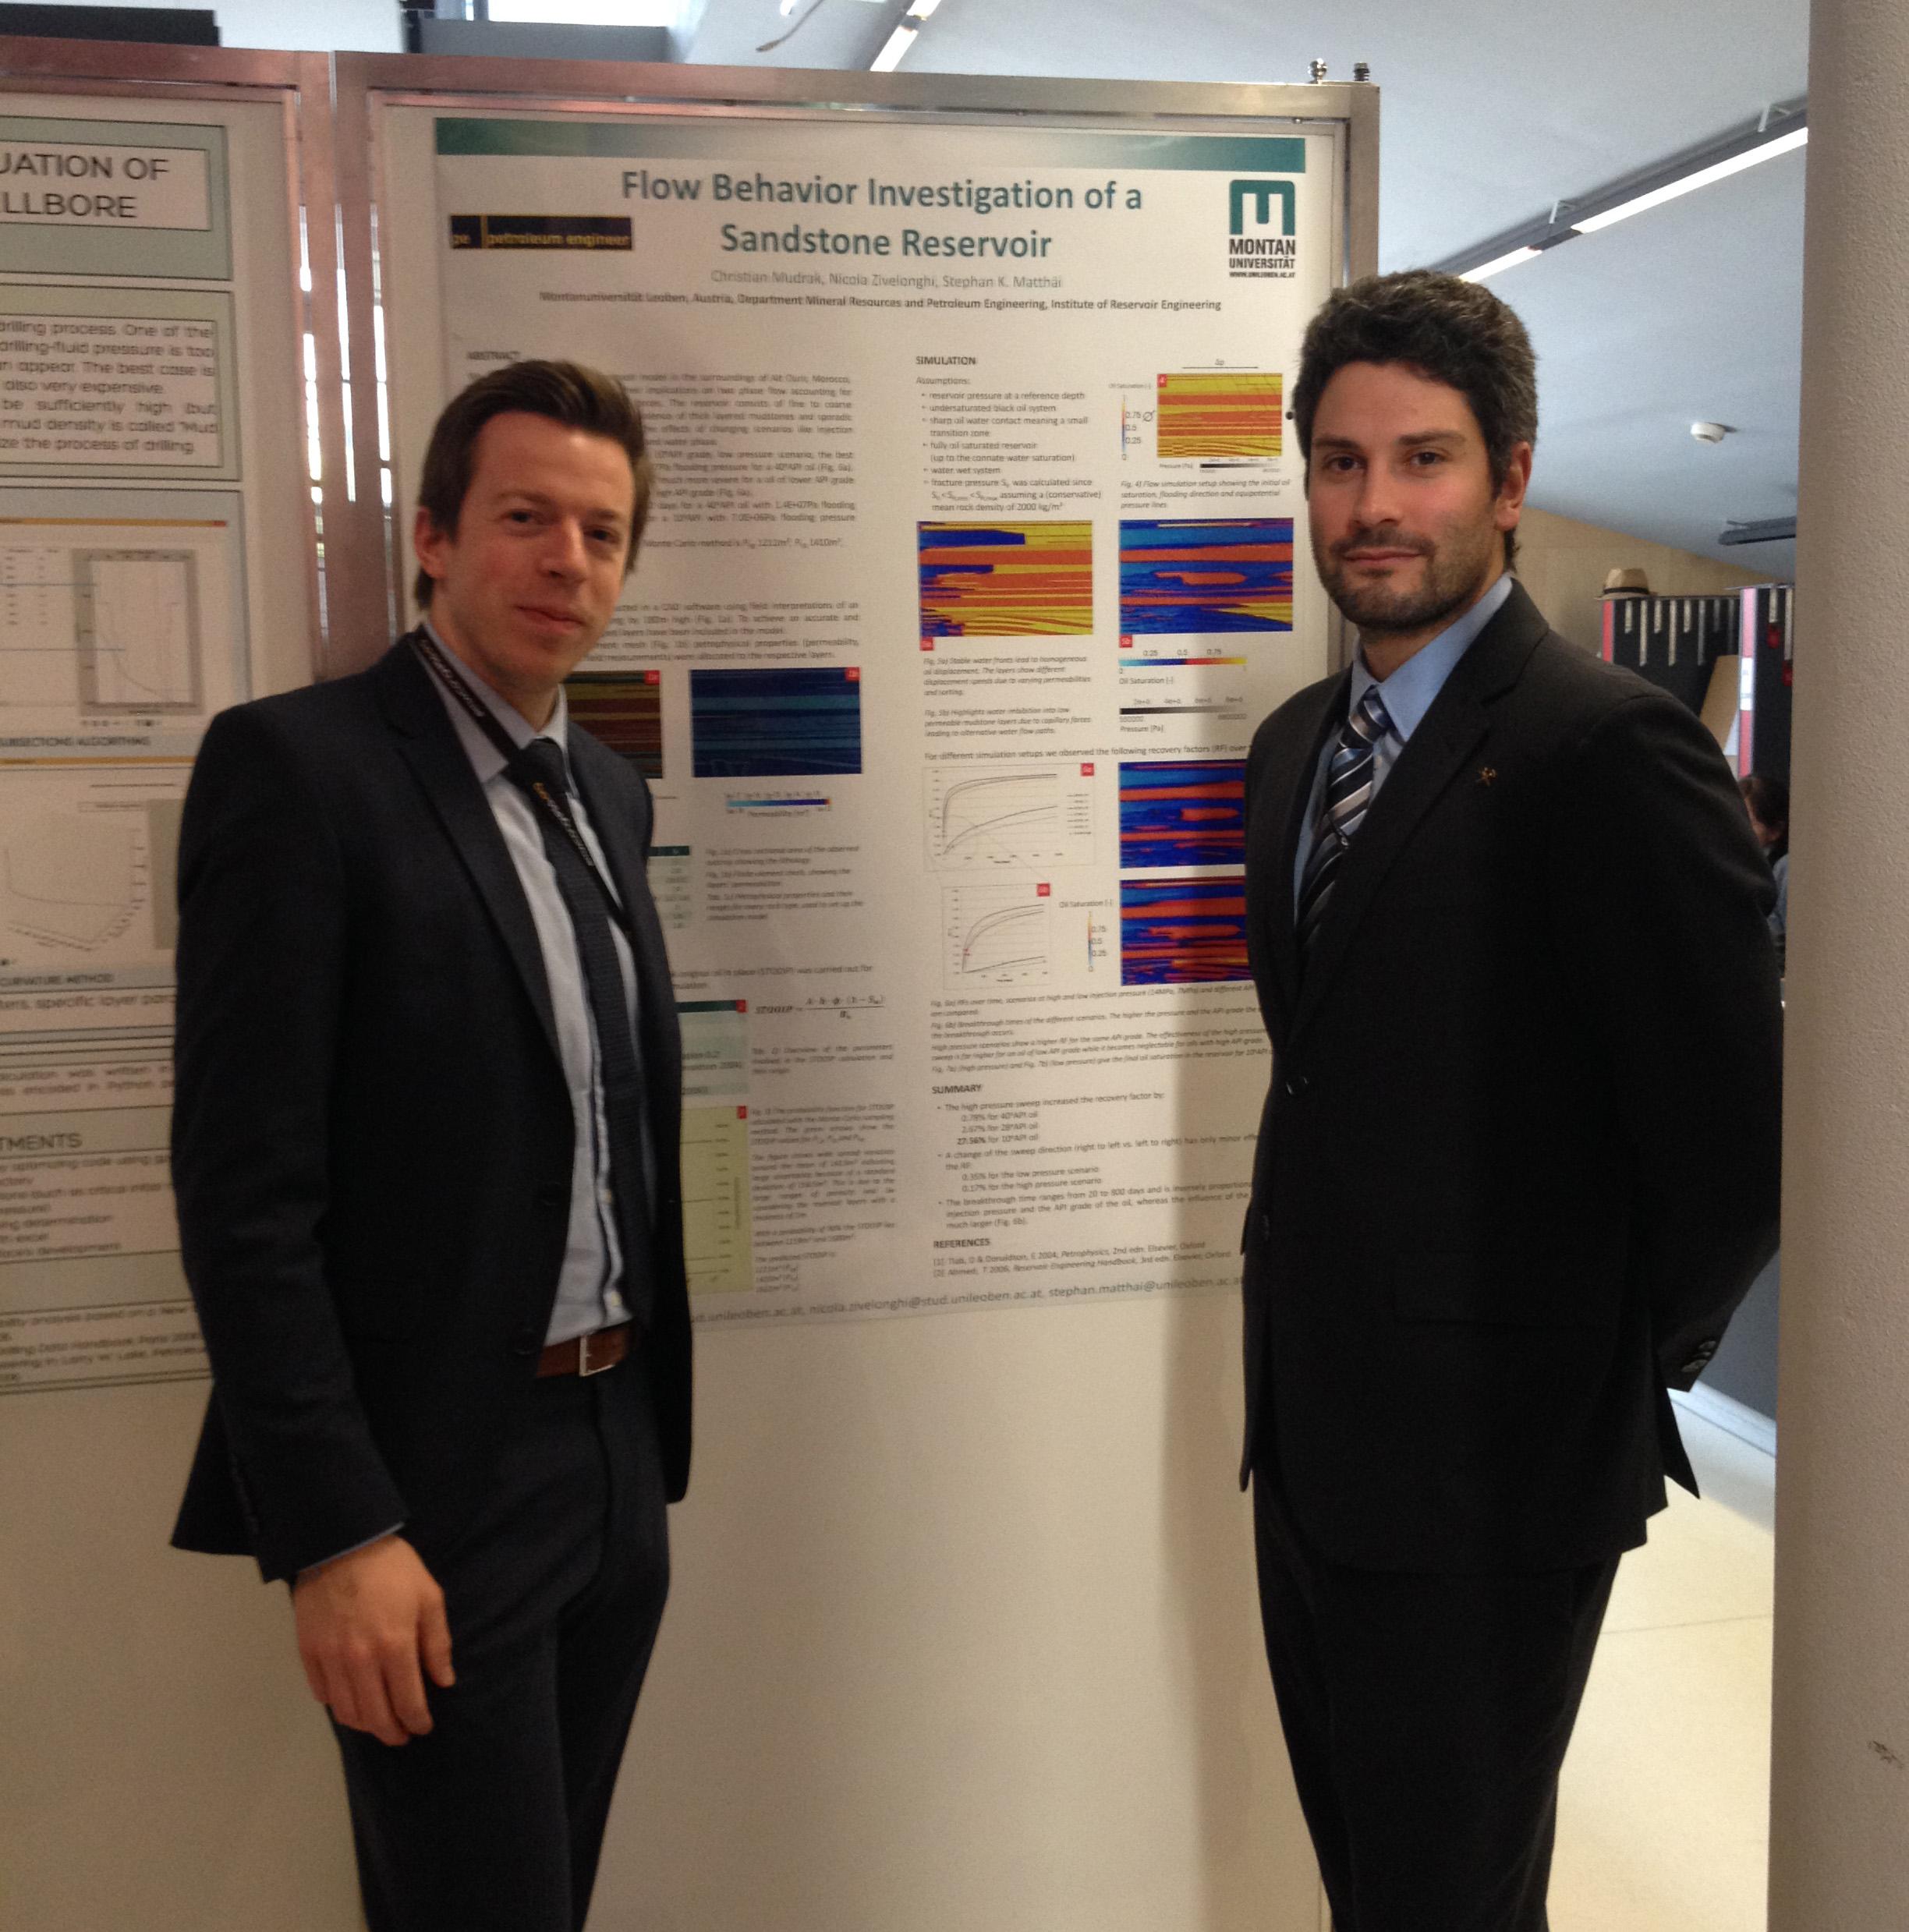 Christian Mudrak & Nicola Zivelonghi next to their poster presentation